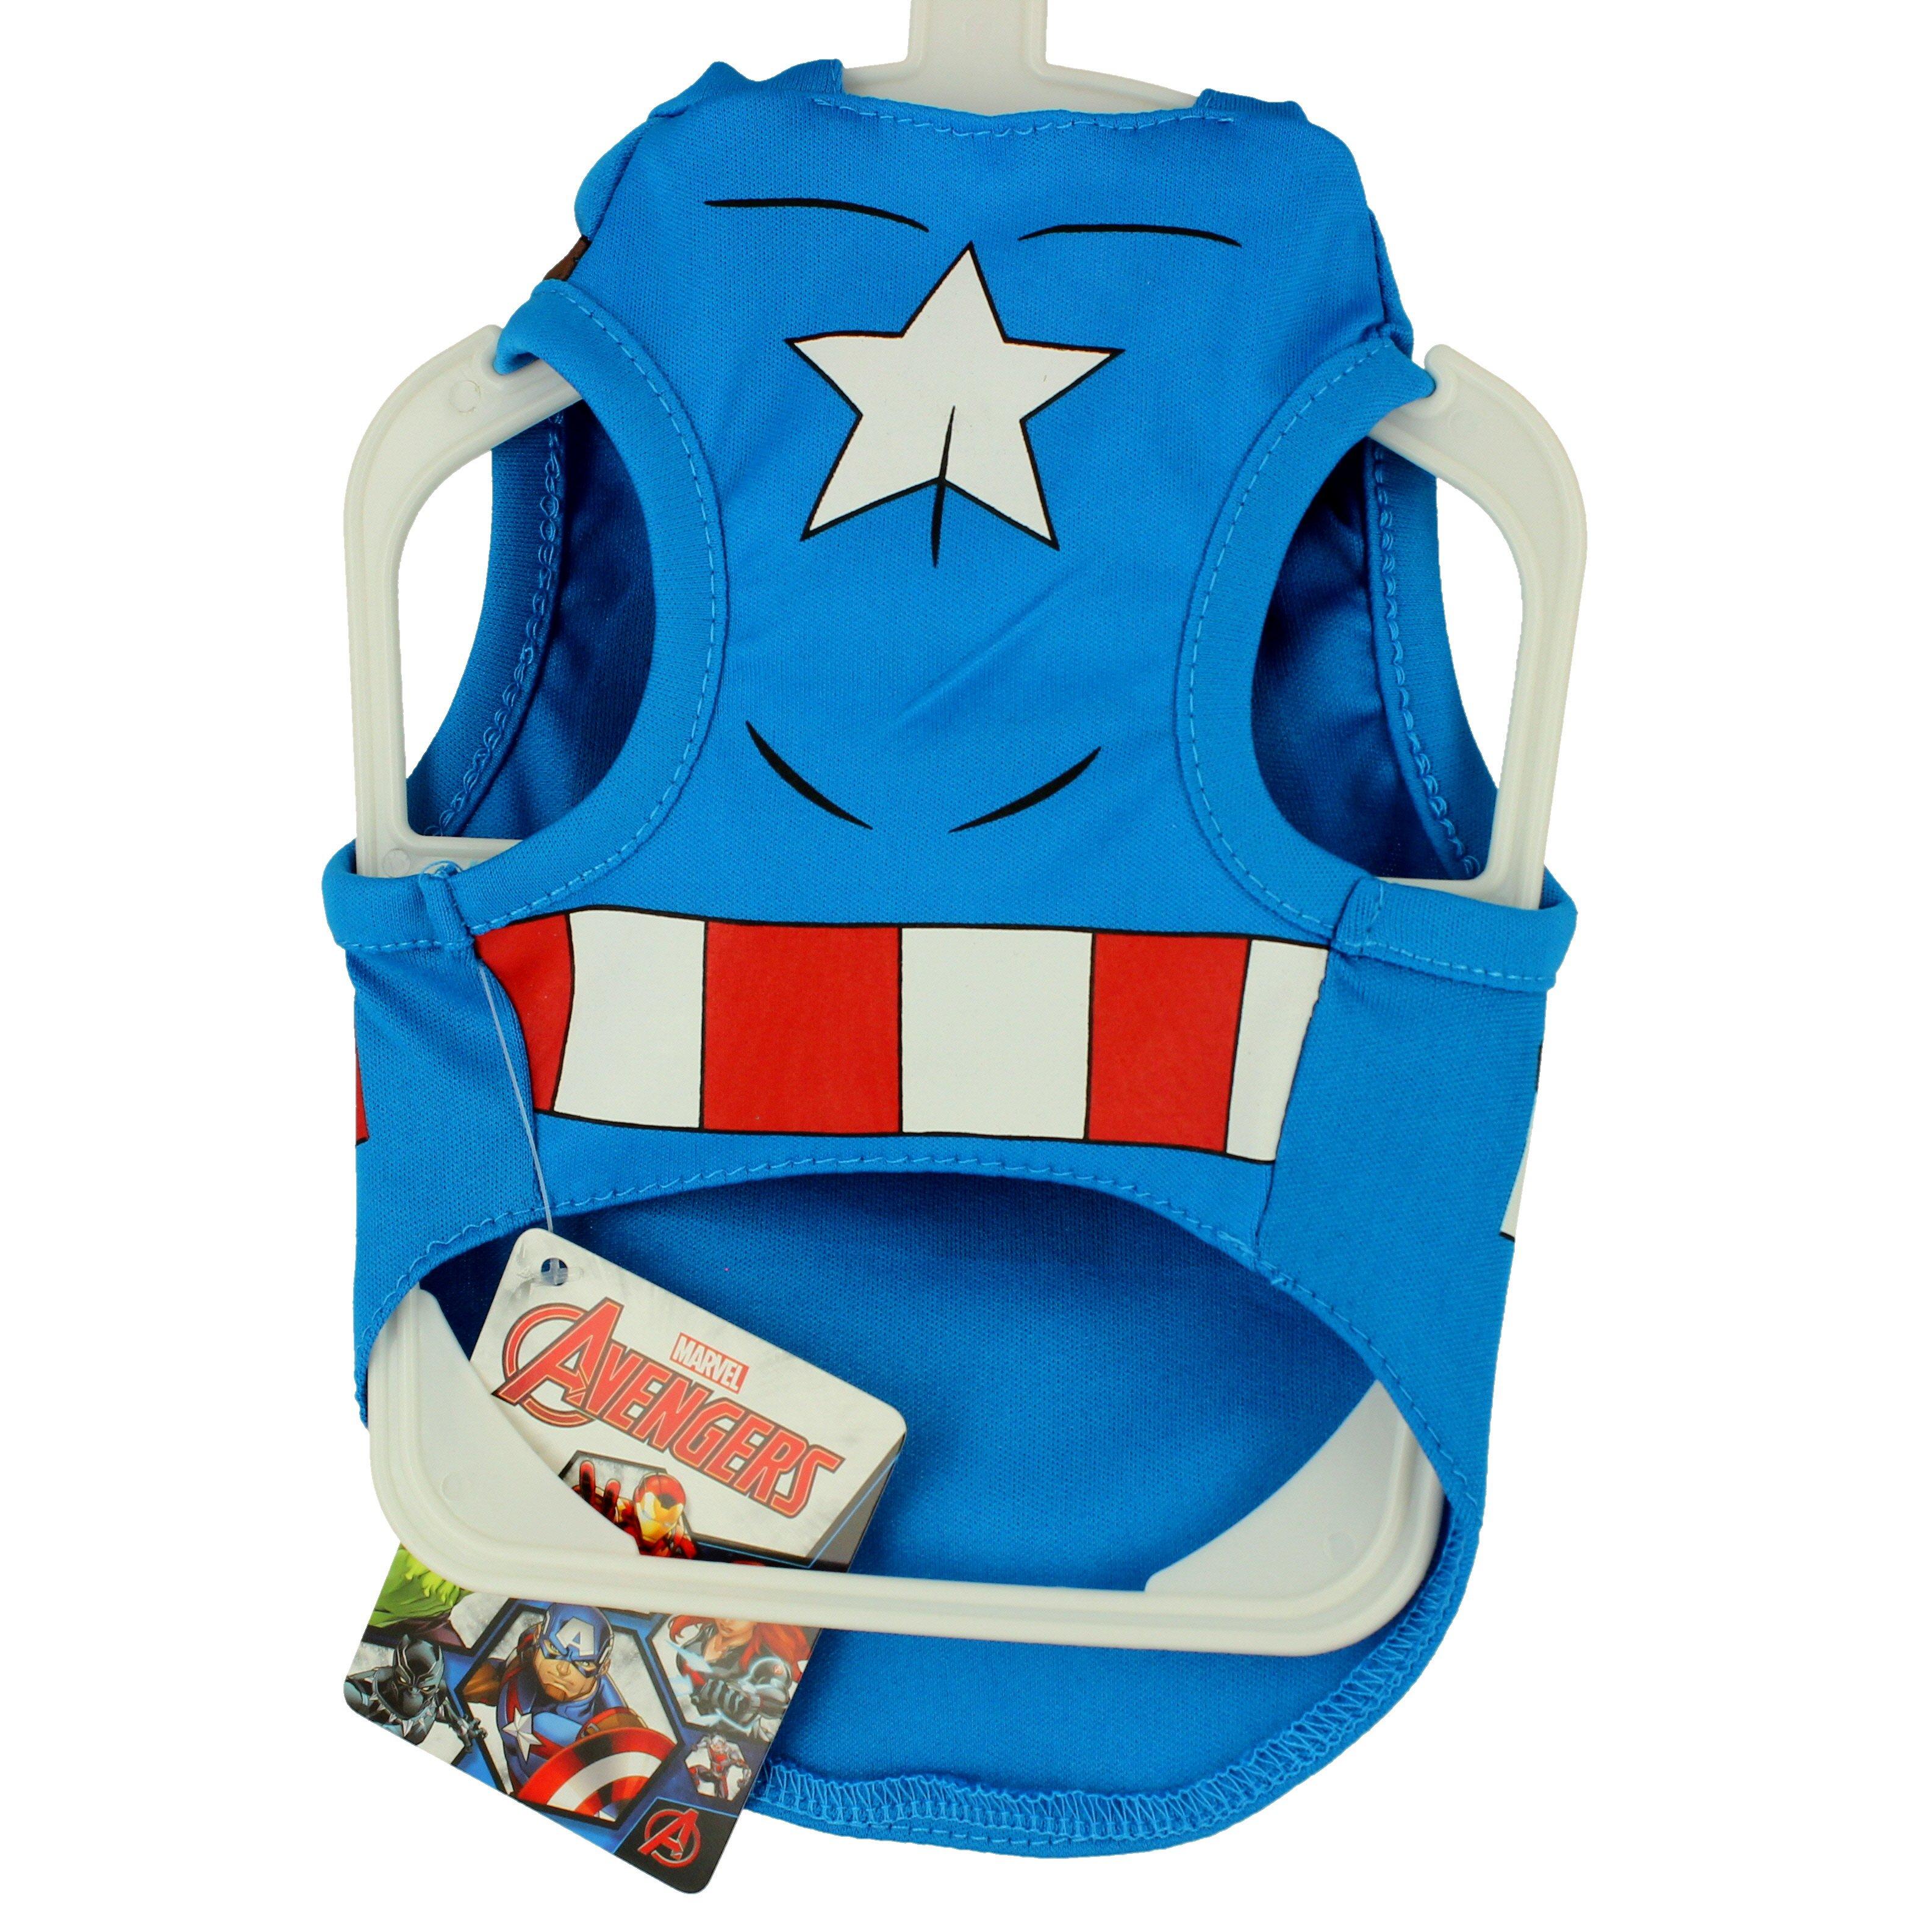 Marvel Captain America Dog Costume Shop Dogs At H E B Marvel carol danvers cosplay costume upgrade. heb com